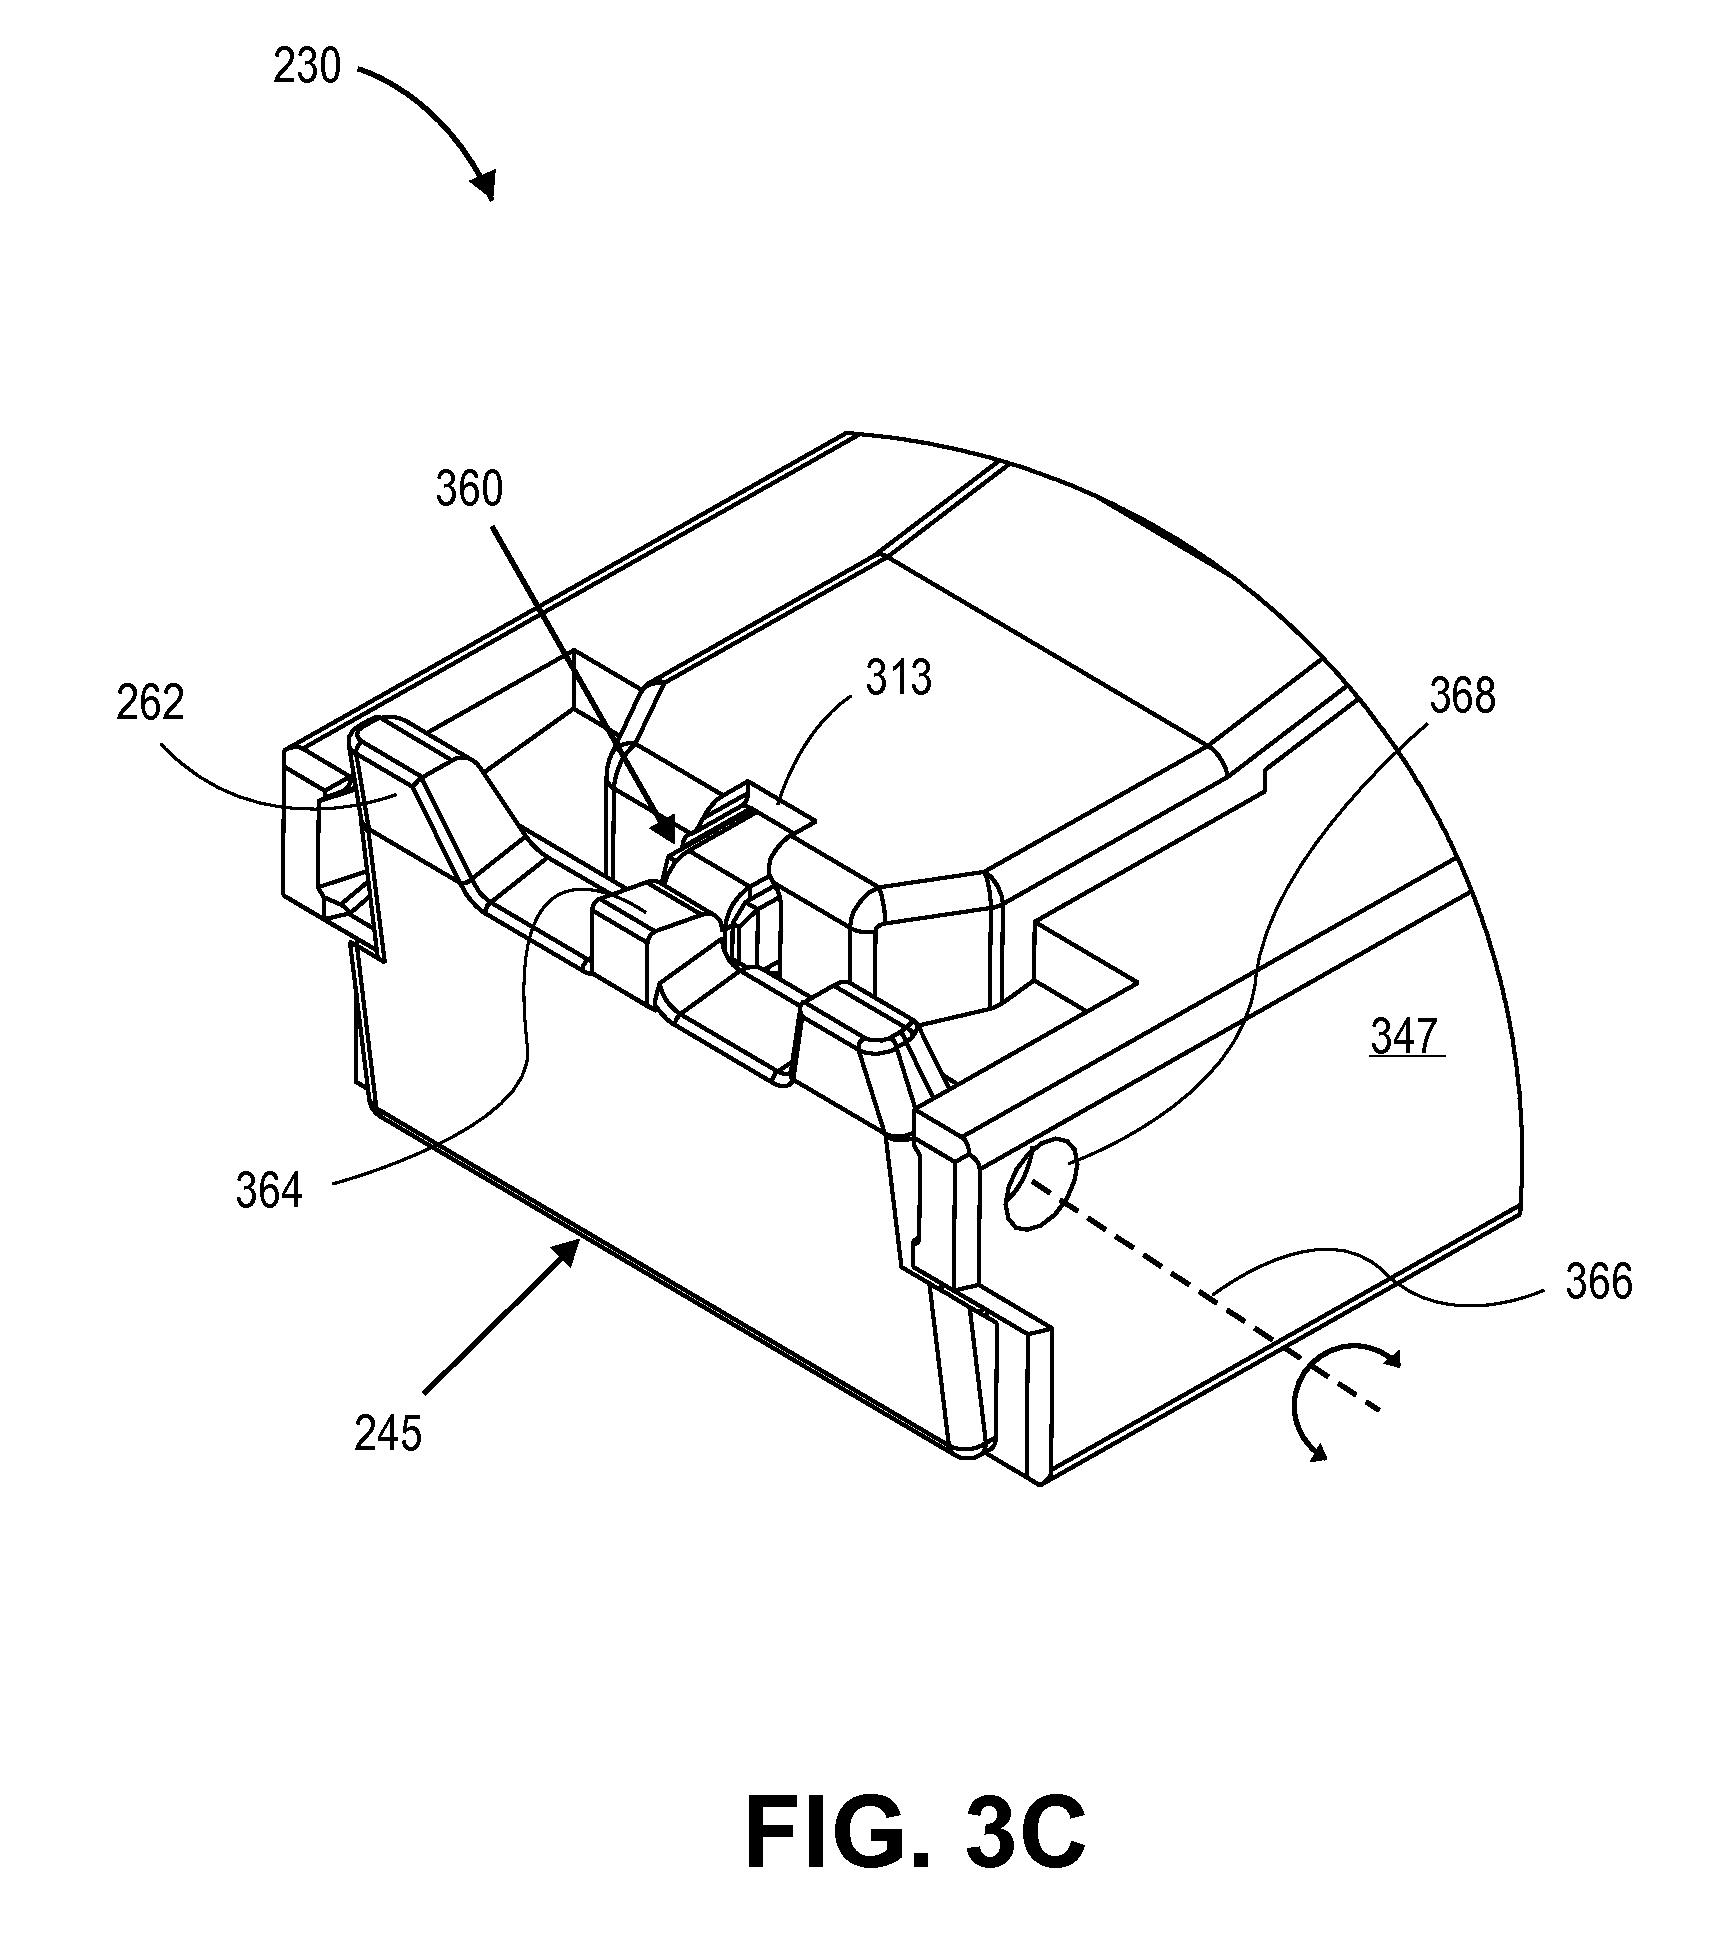 quad receptacle wiring diagram rj11 rj12 a auto electrical 30 images